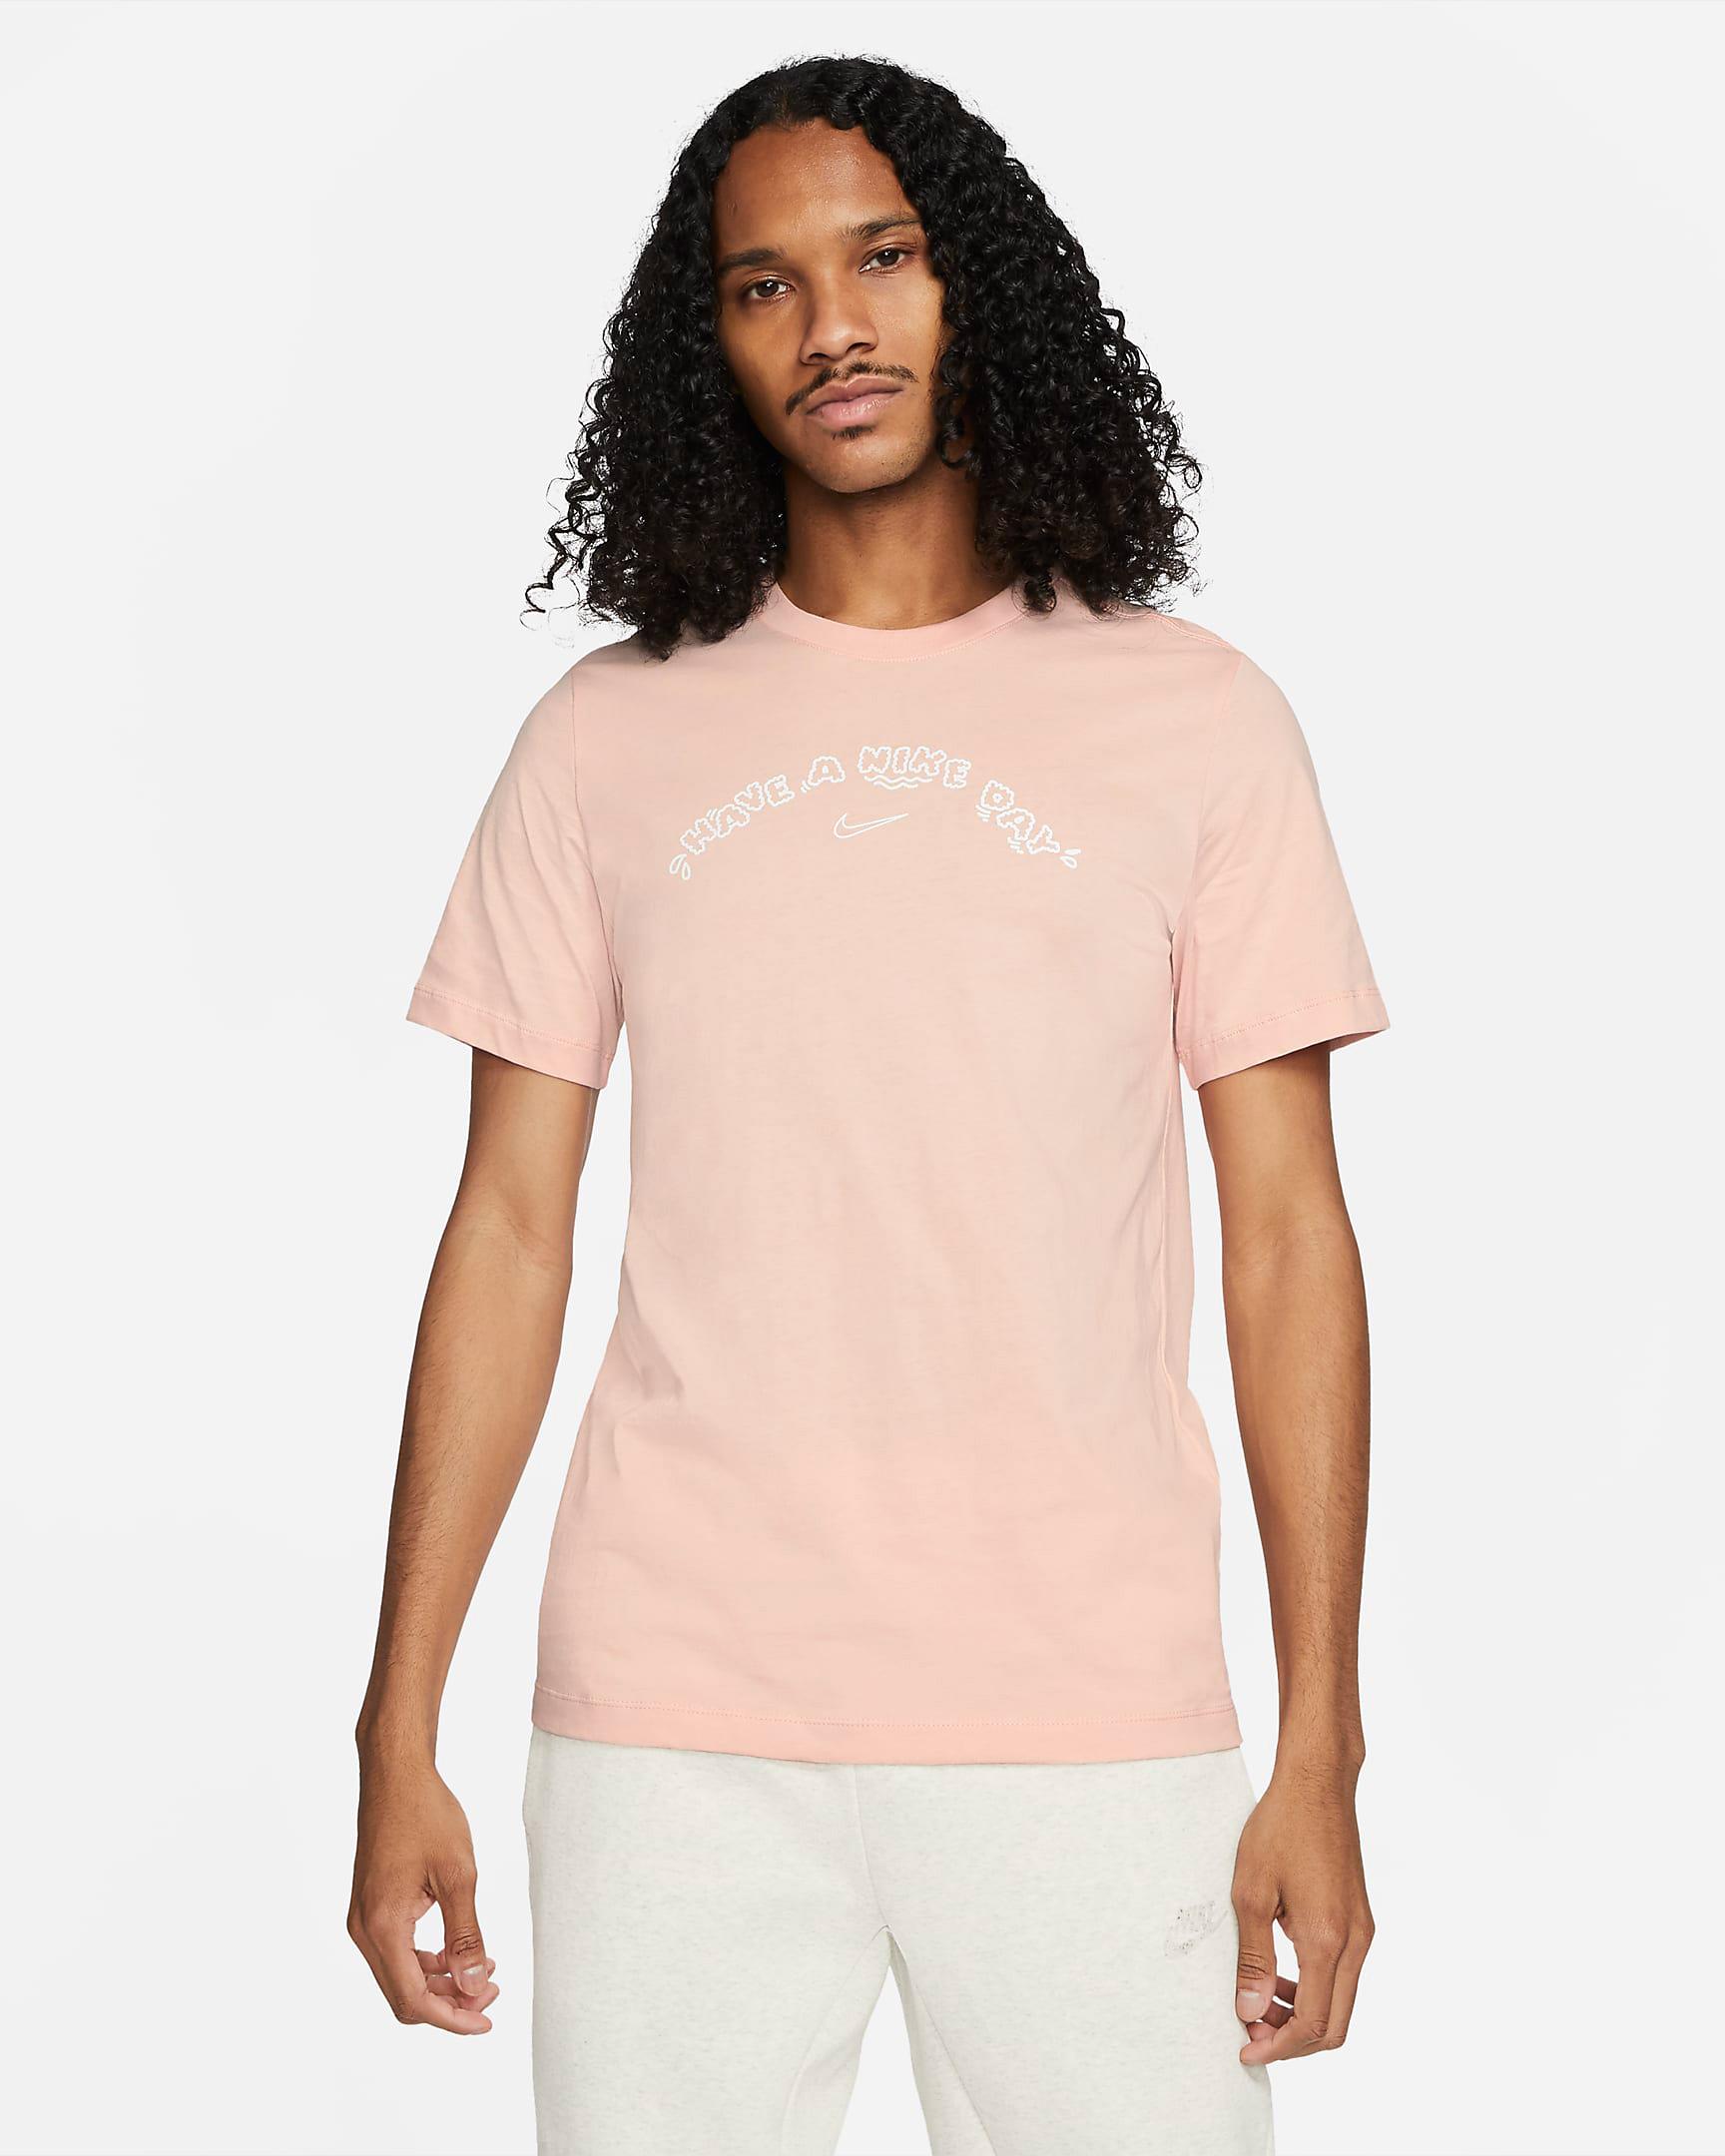 nike-arctic-orange-nike-day-t-shirt-1